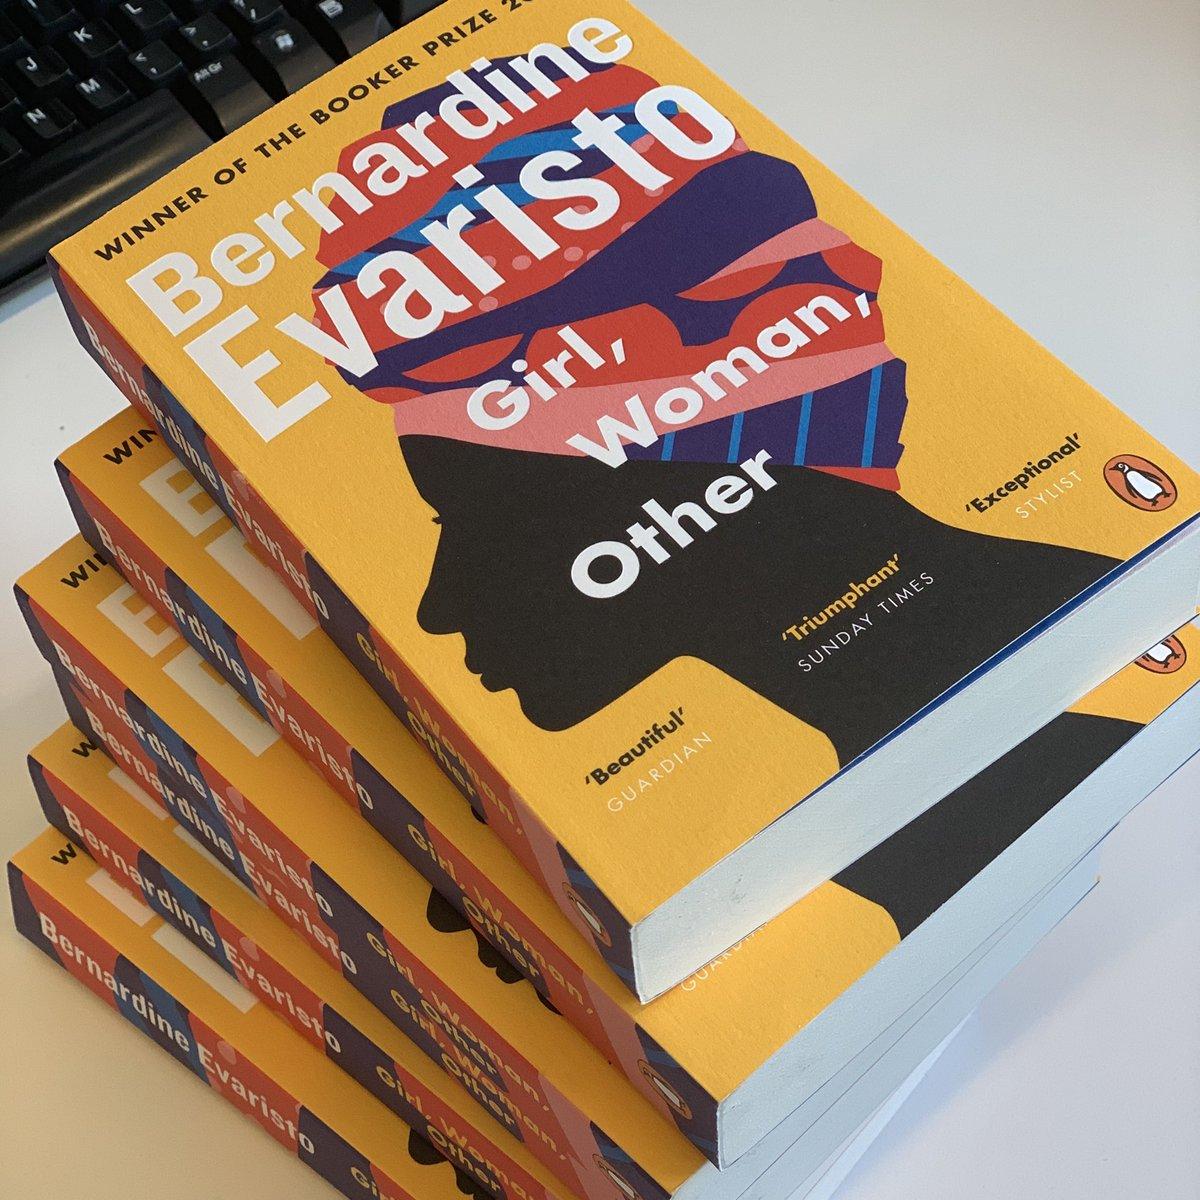 Advance paperback copies just in for @BernardineEvari's Booker winning GIRL, WOMAN, OTHER —